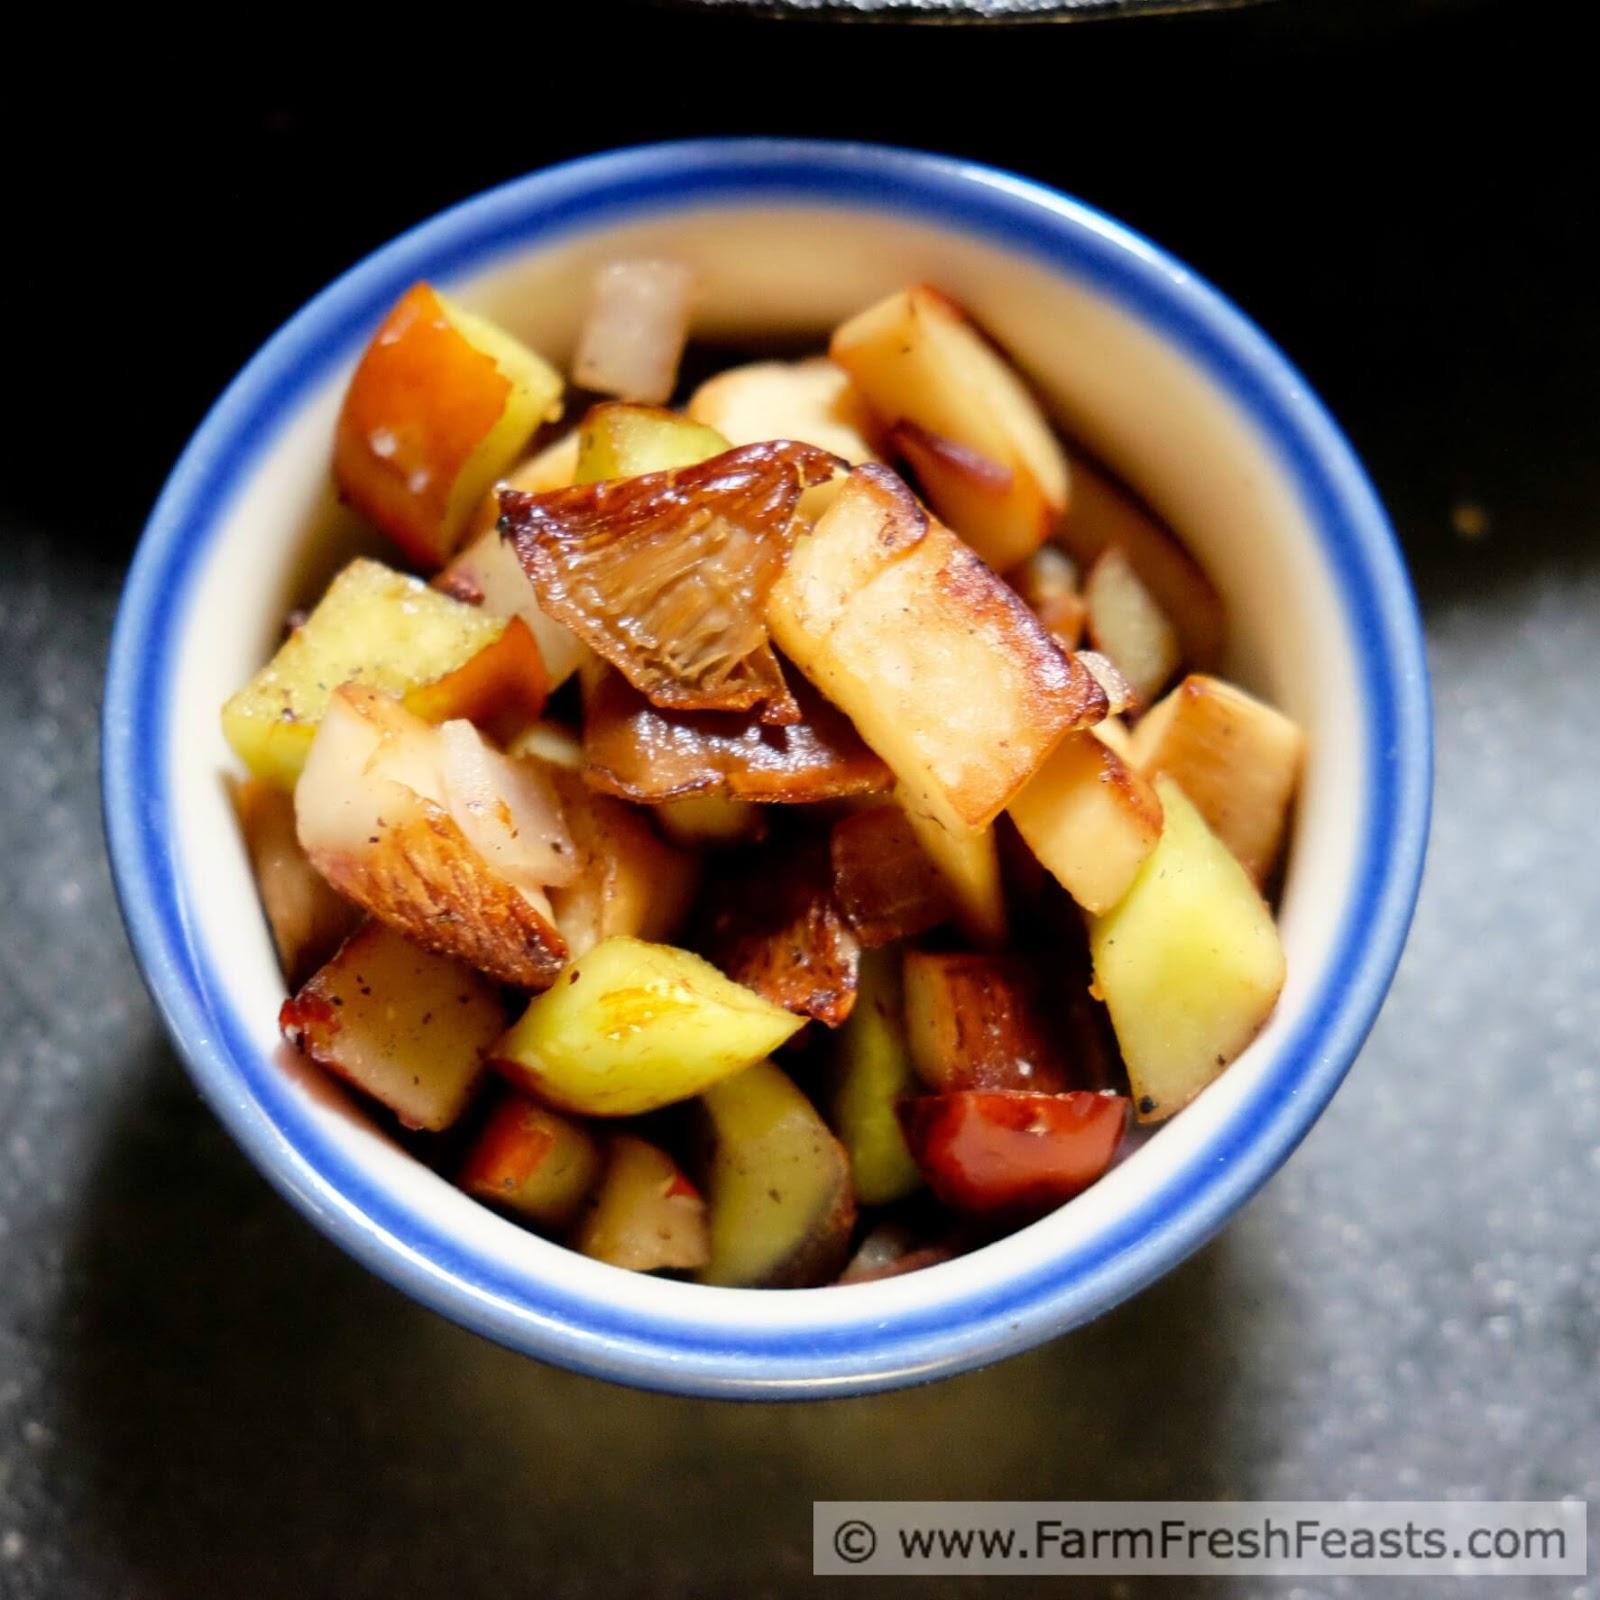 Jujube Fruit And King Oyster Mushroom Saute Farm Fresh Feasts